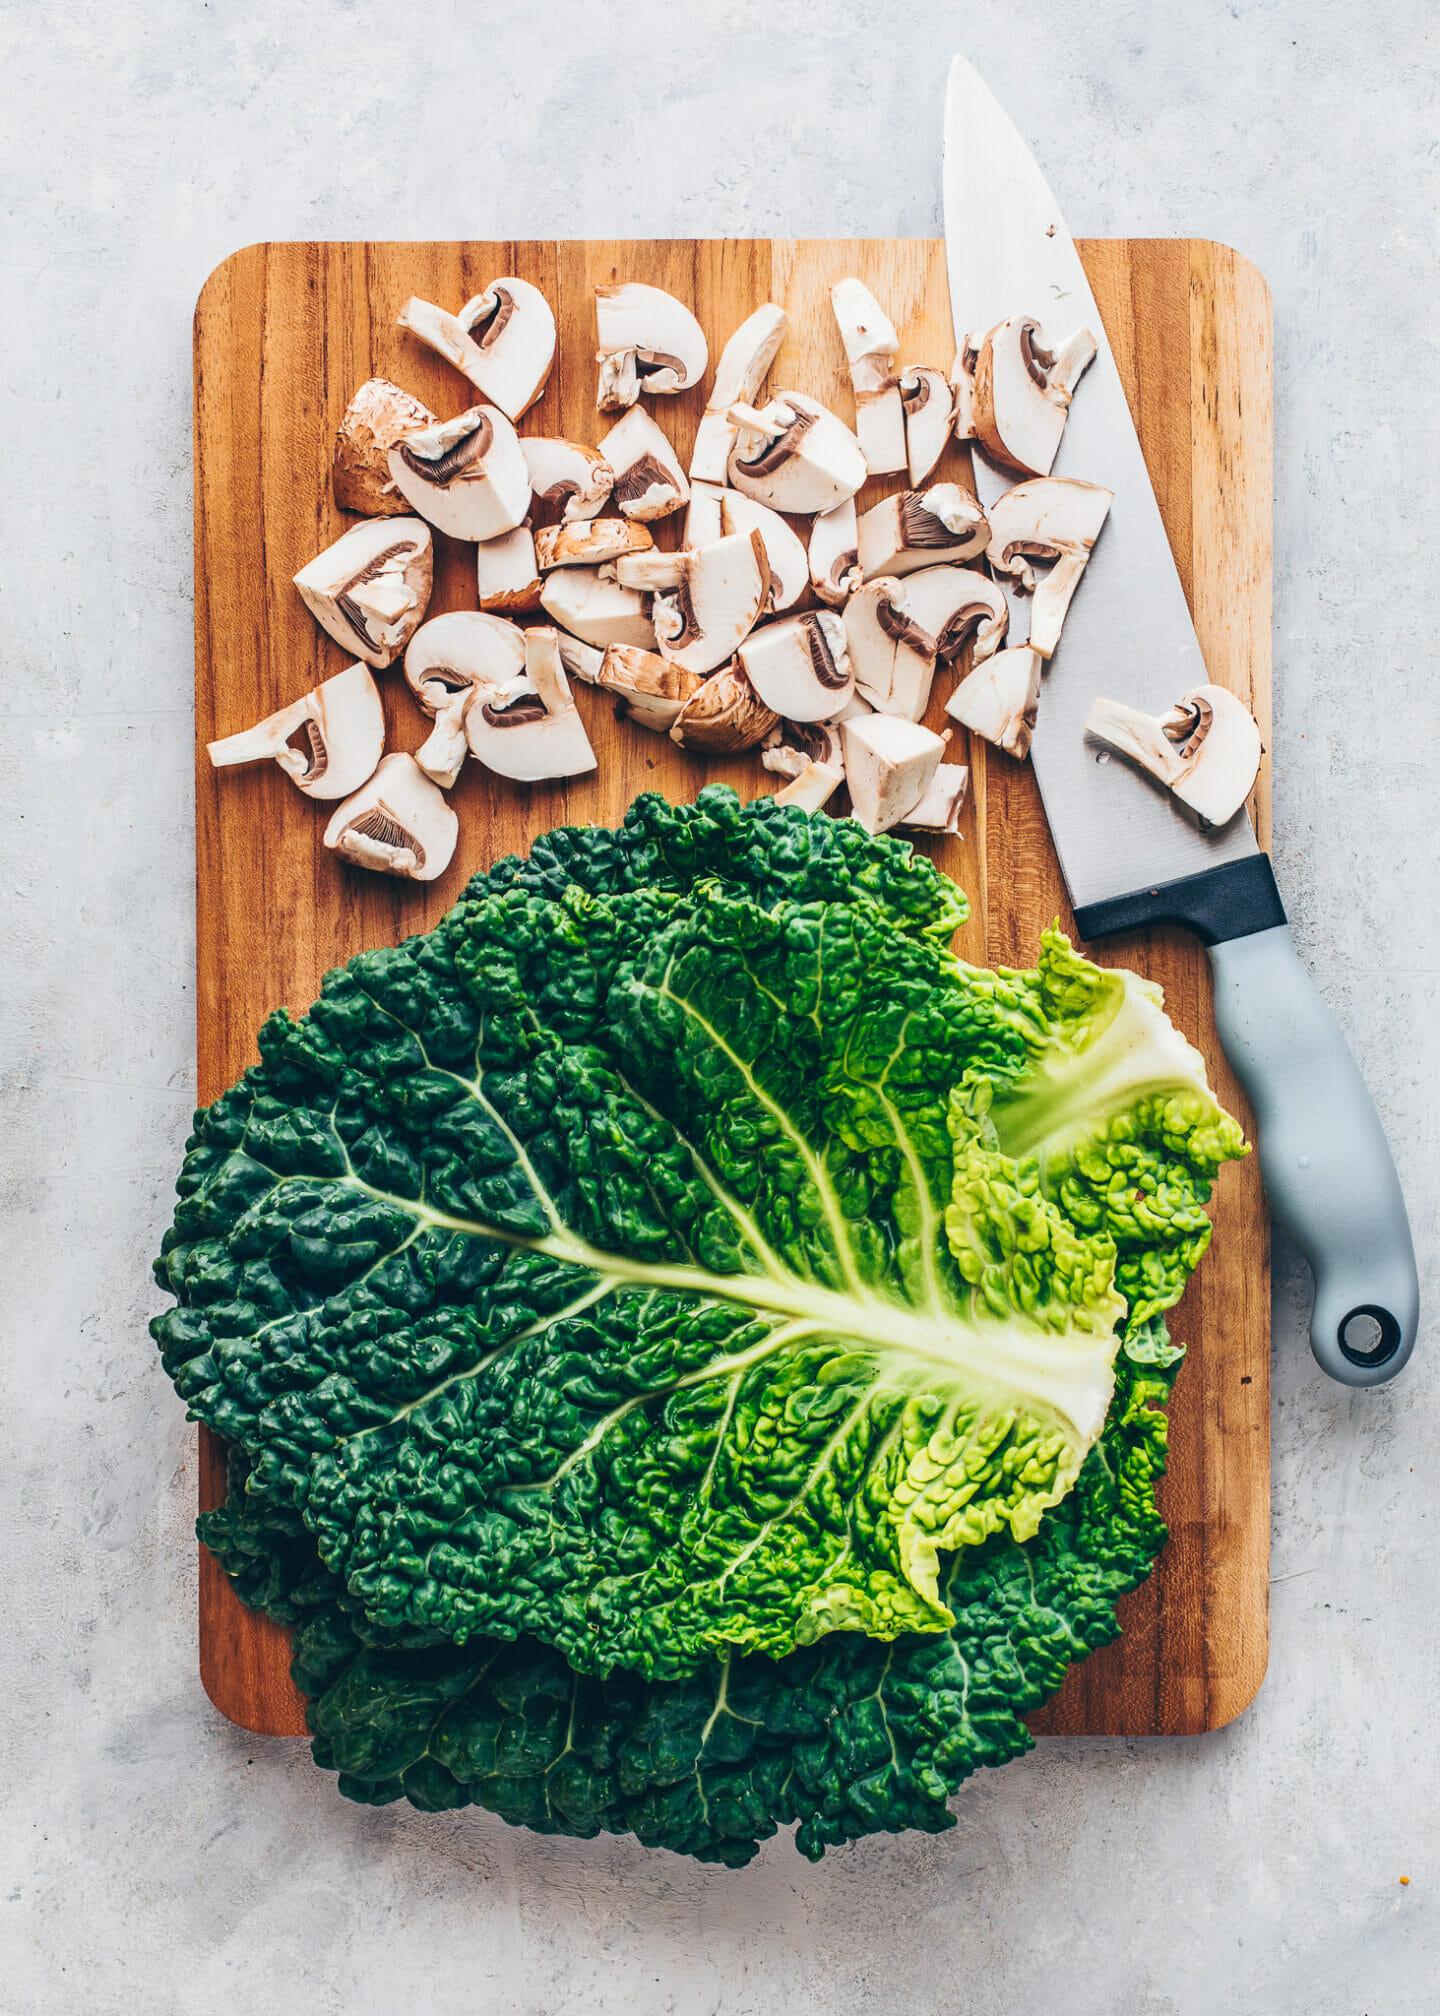 Mushrooms and Kale